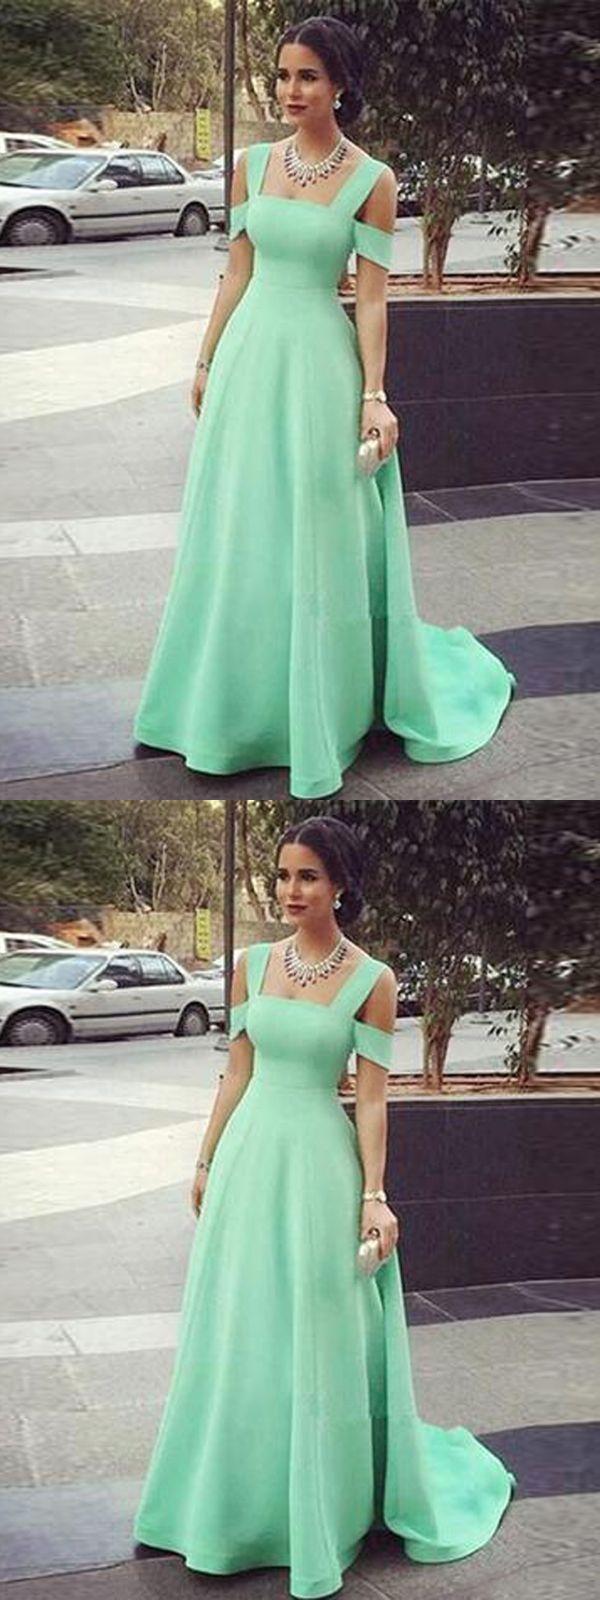 Long prom dress aline simple straps green cheap prom dress vb